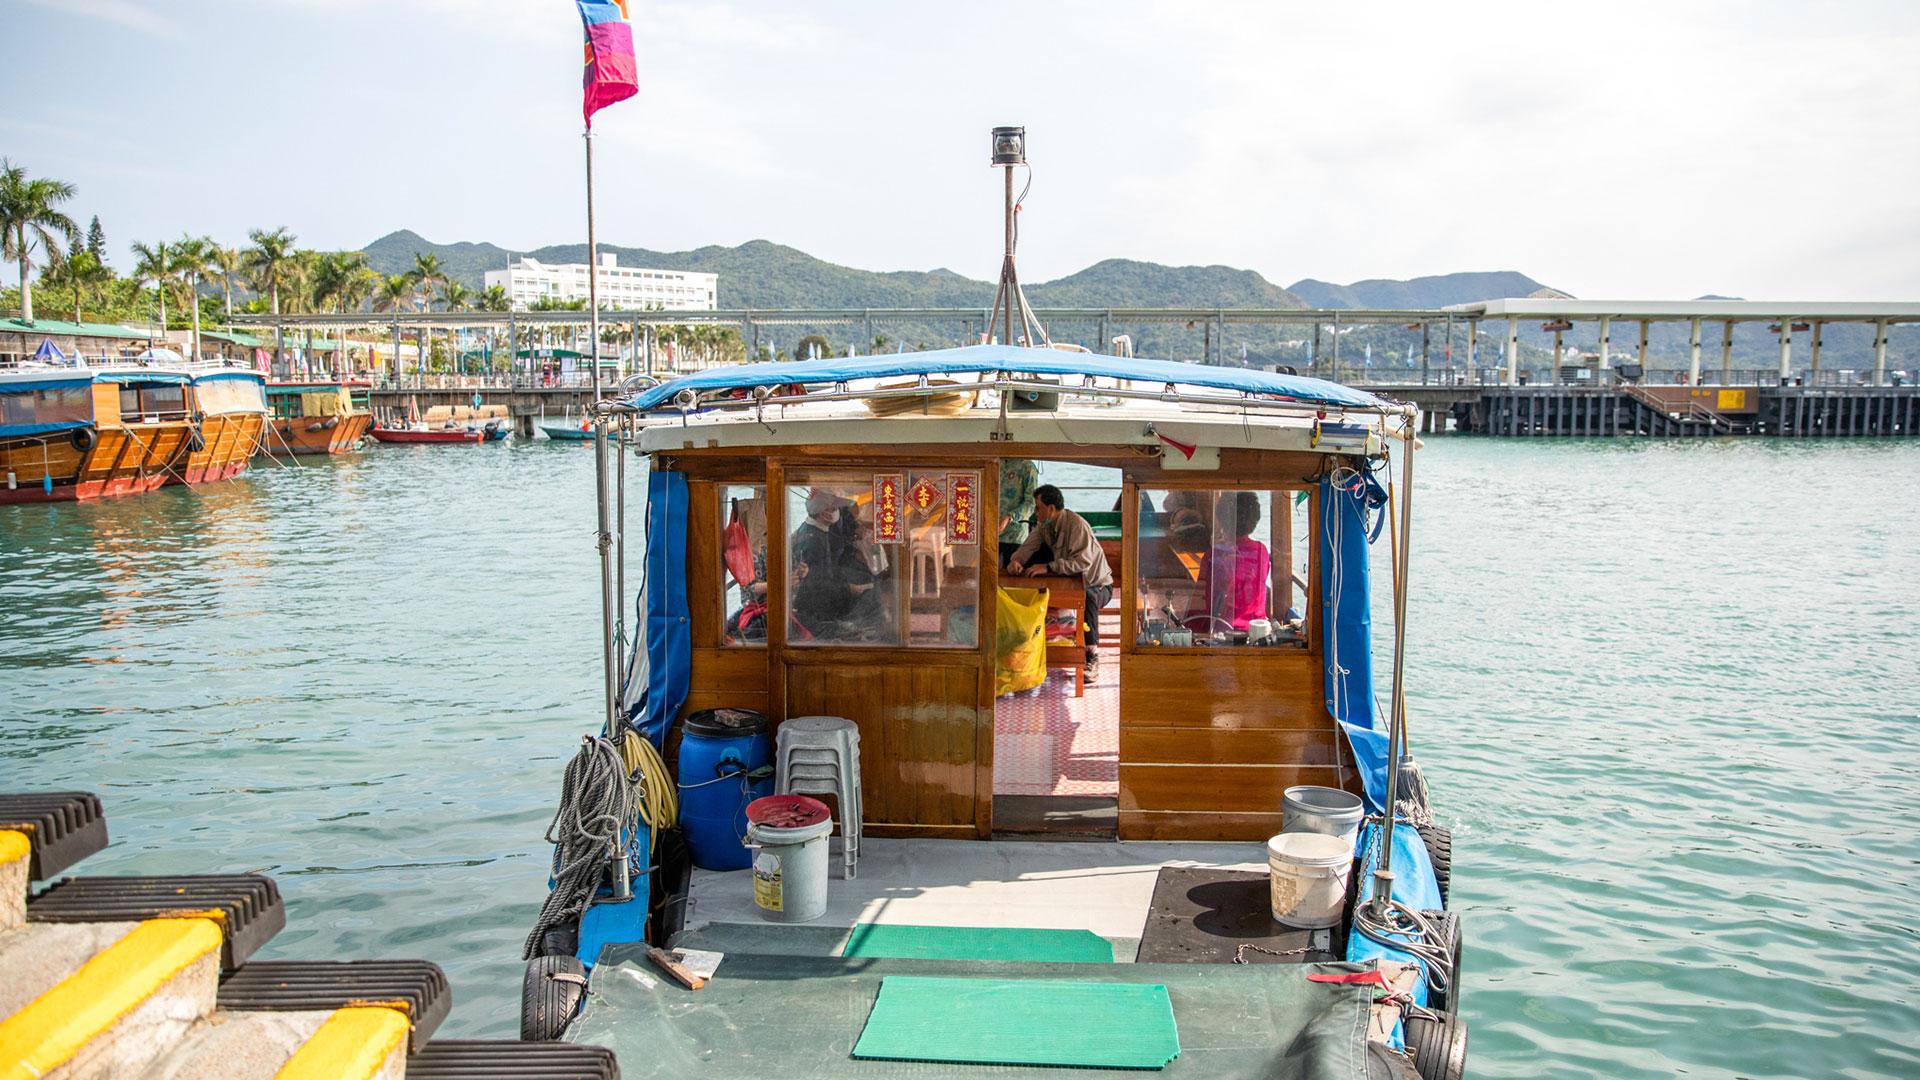 Yim Tin Tsai ferry depart from Sai Kung waterfront